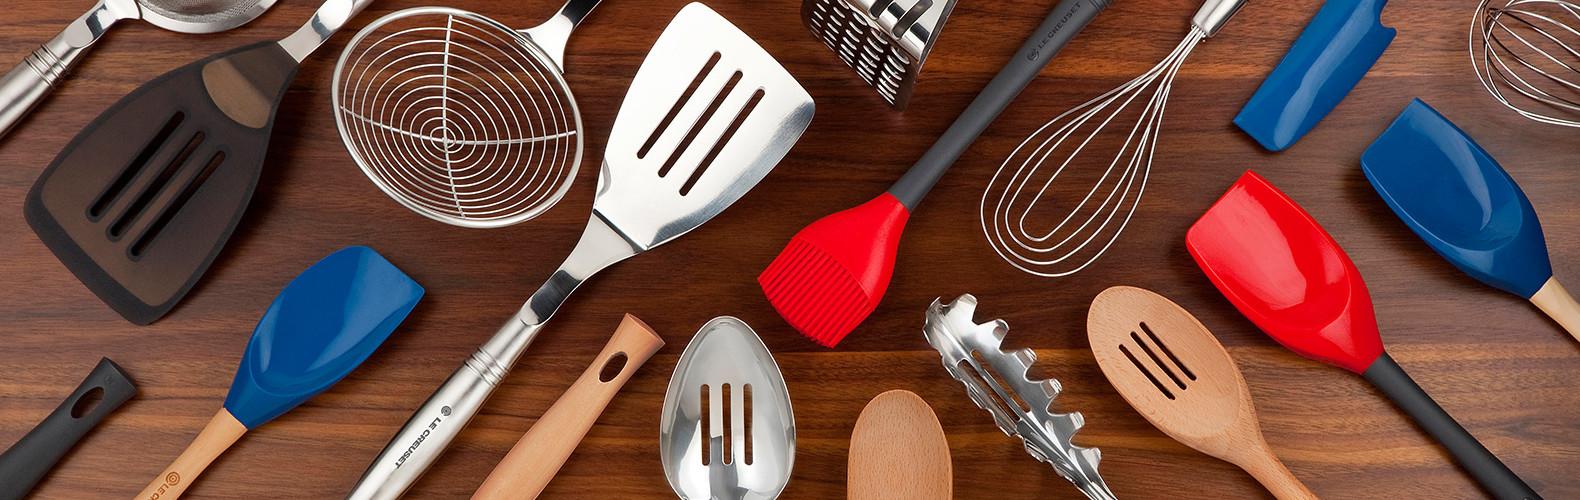 cb_dCT_20161014_kitchen_tools.jpeg